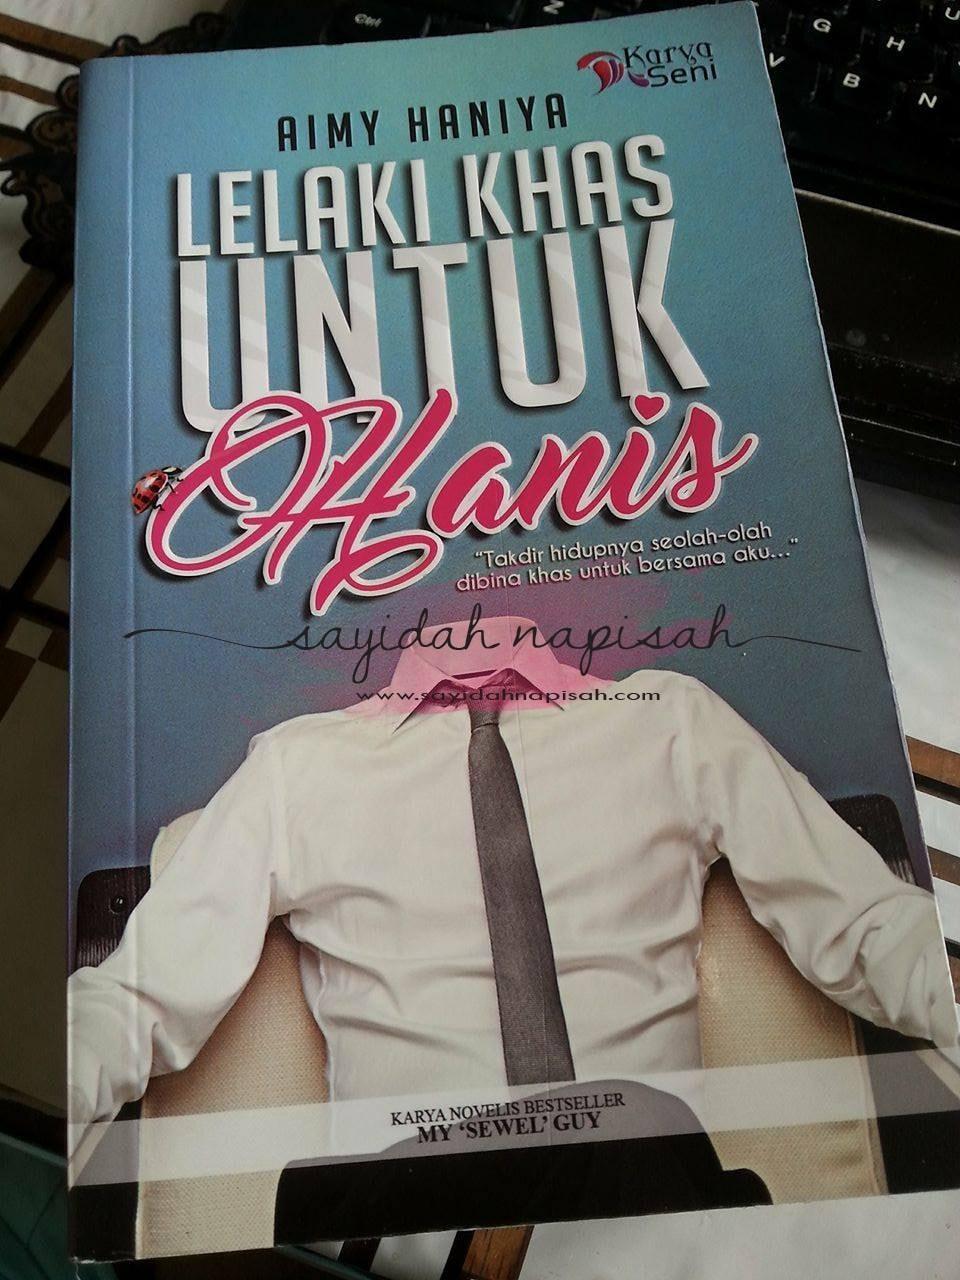 Review NOVEL LELAKI KHAS UNTUK Hanis - AIMY HANIYA